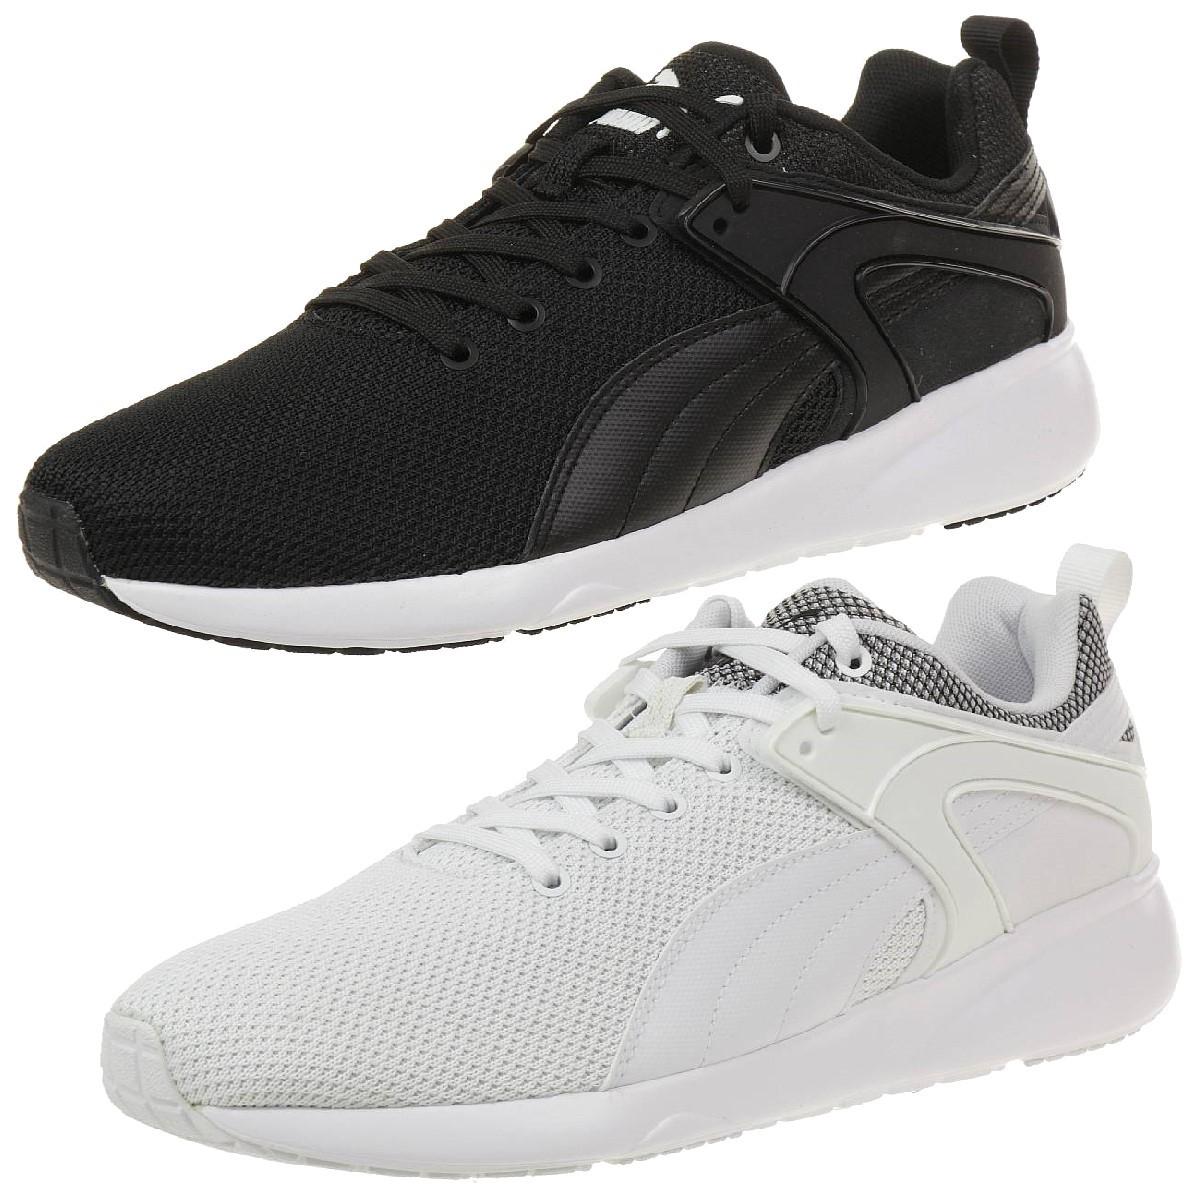 Puma Aril Blaze Sneaker / Laufschuh (PVG Idealo: 37€)